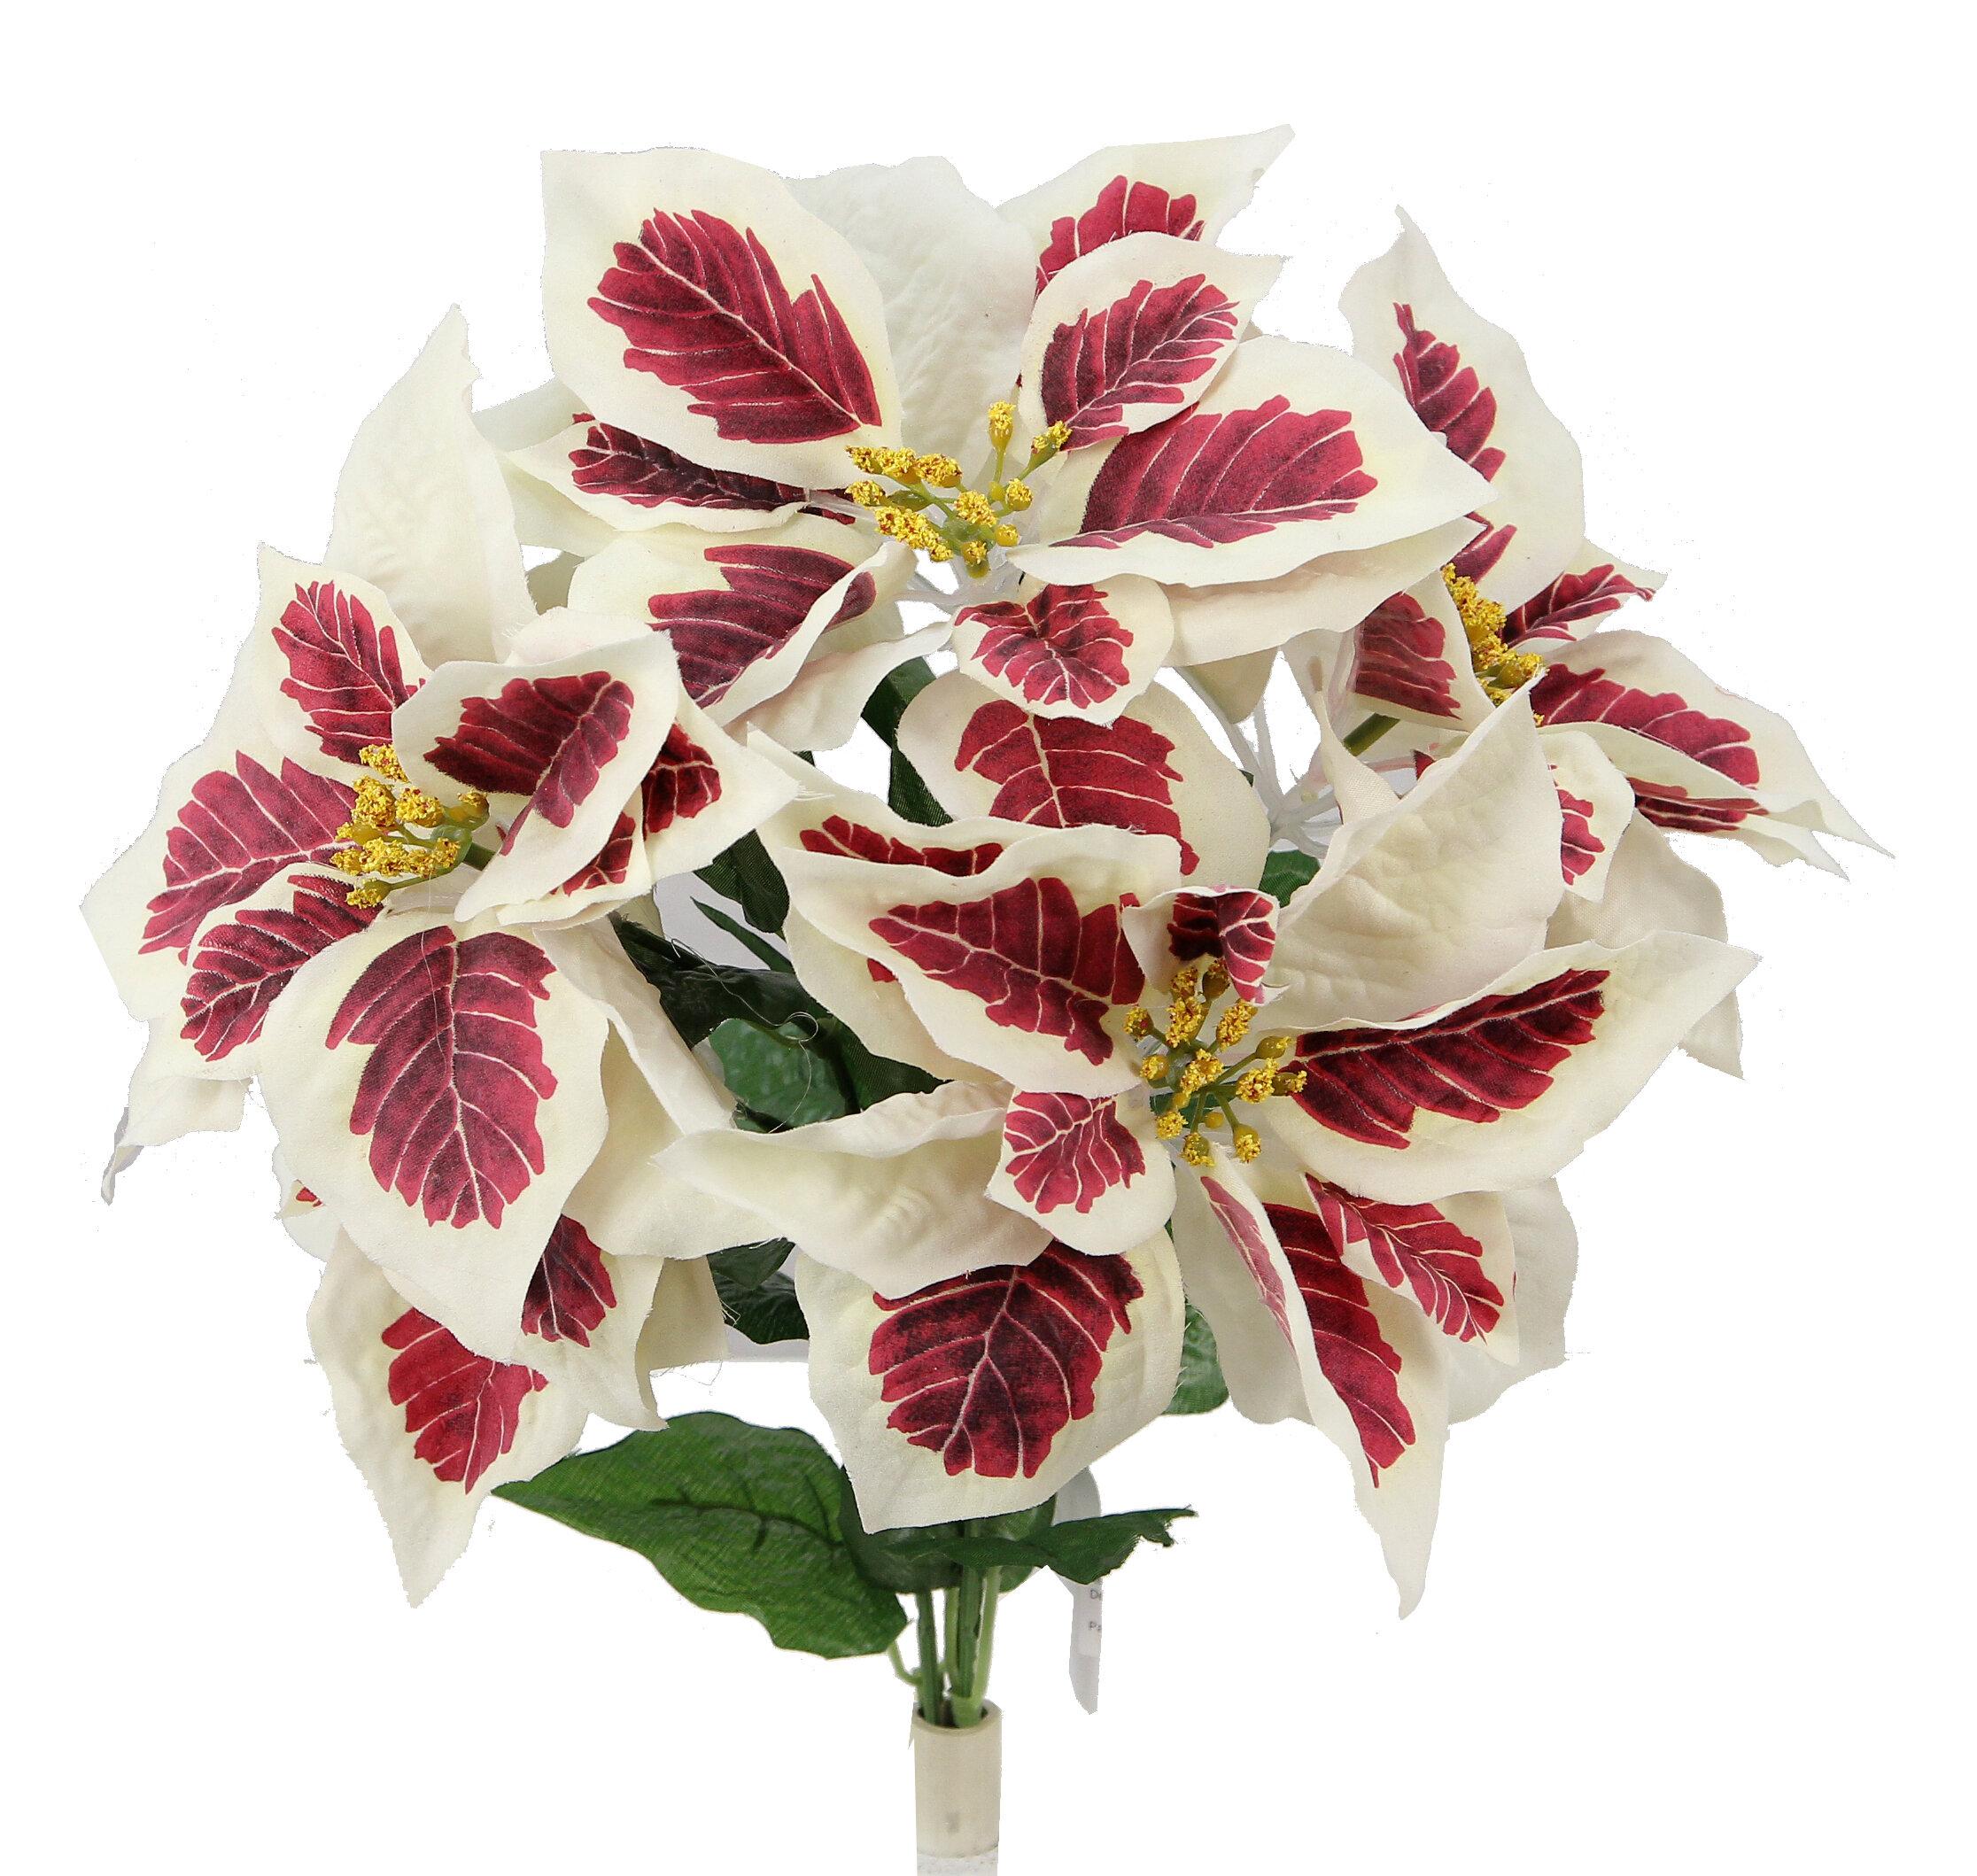 The Holiday Aisle 5 Stems Artificial Poinsettia Floral Arrangement